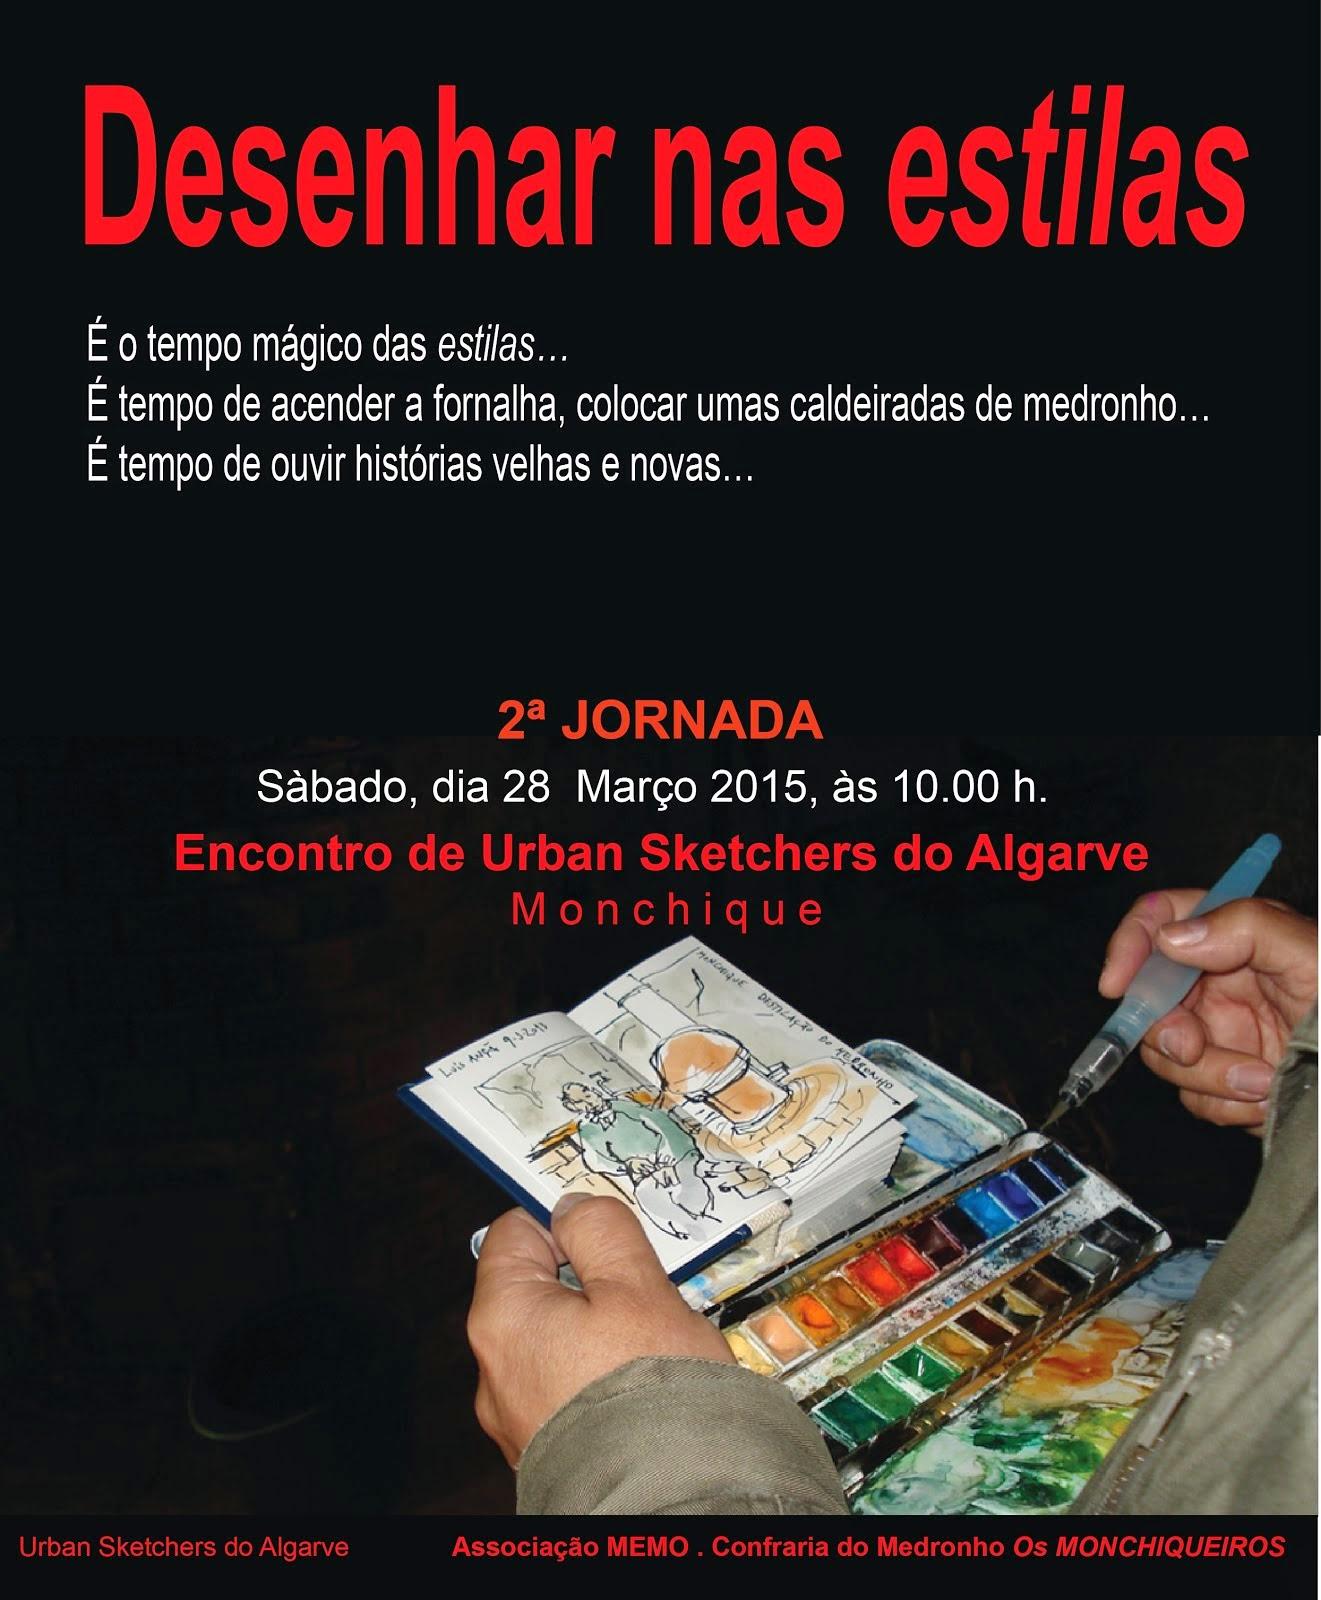 ENCONTRO USkP Algarve - Desenhar nas Estilas 2ª jornadas